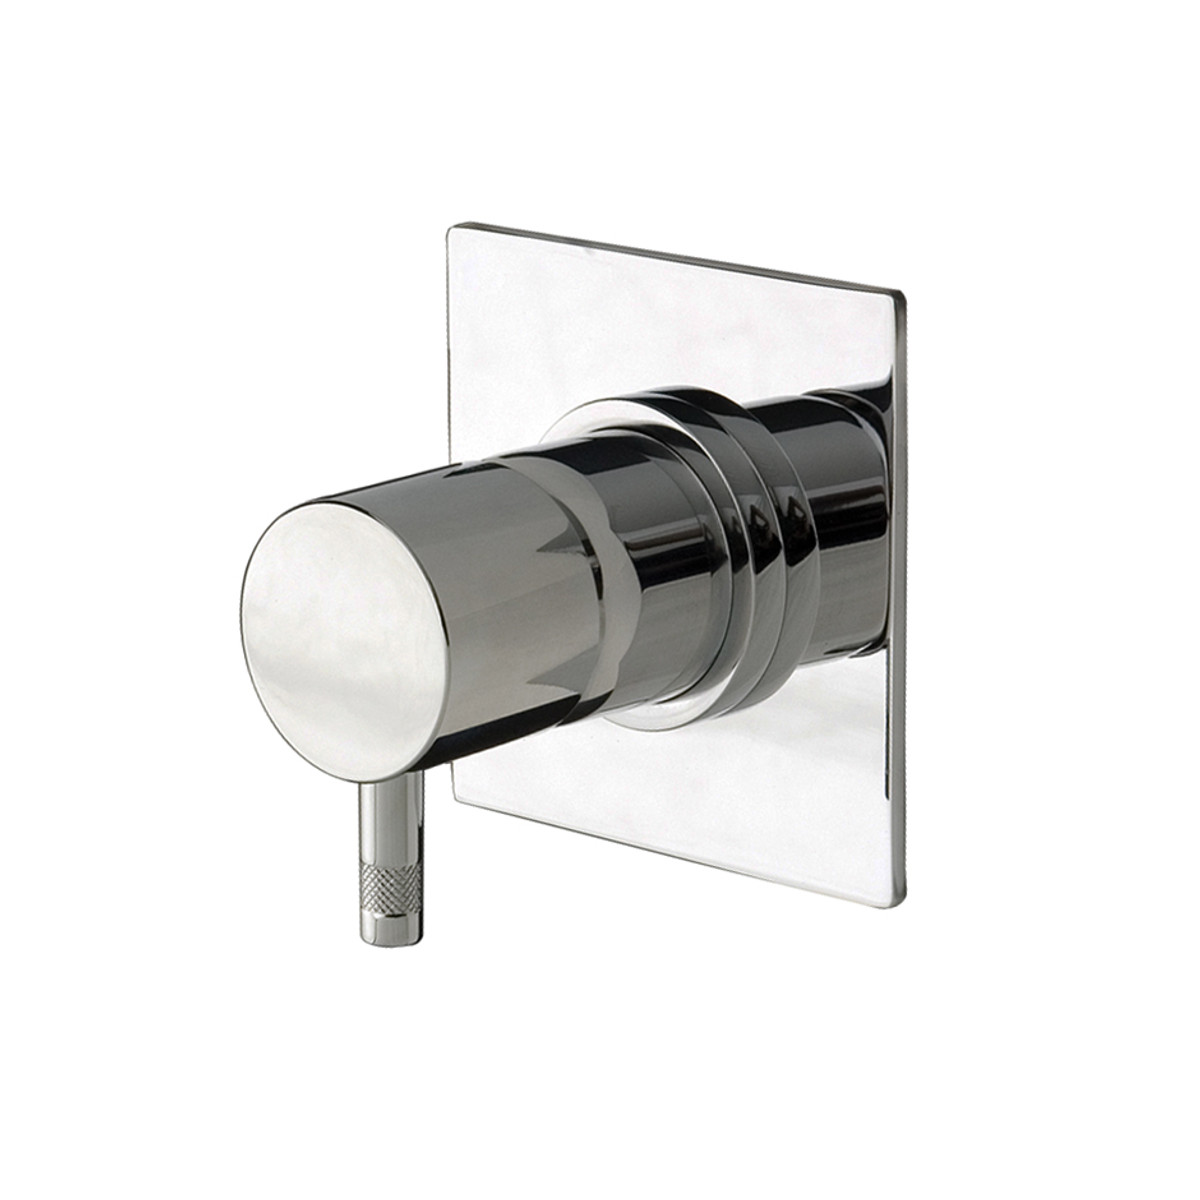 0140 Minimal Single-lever Mixer